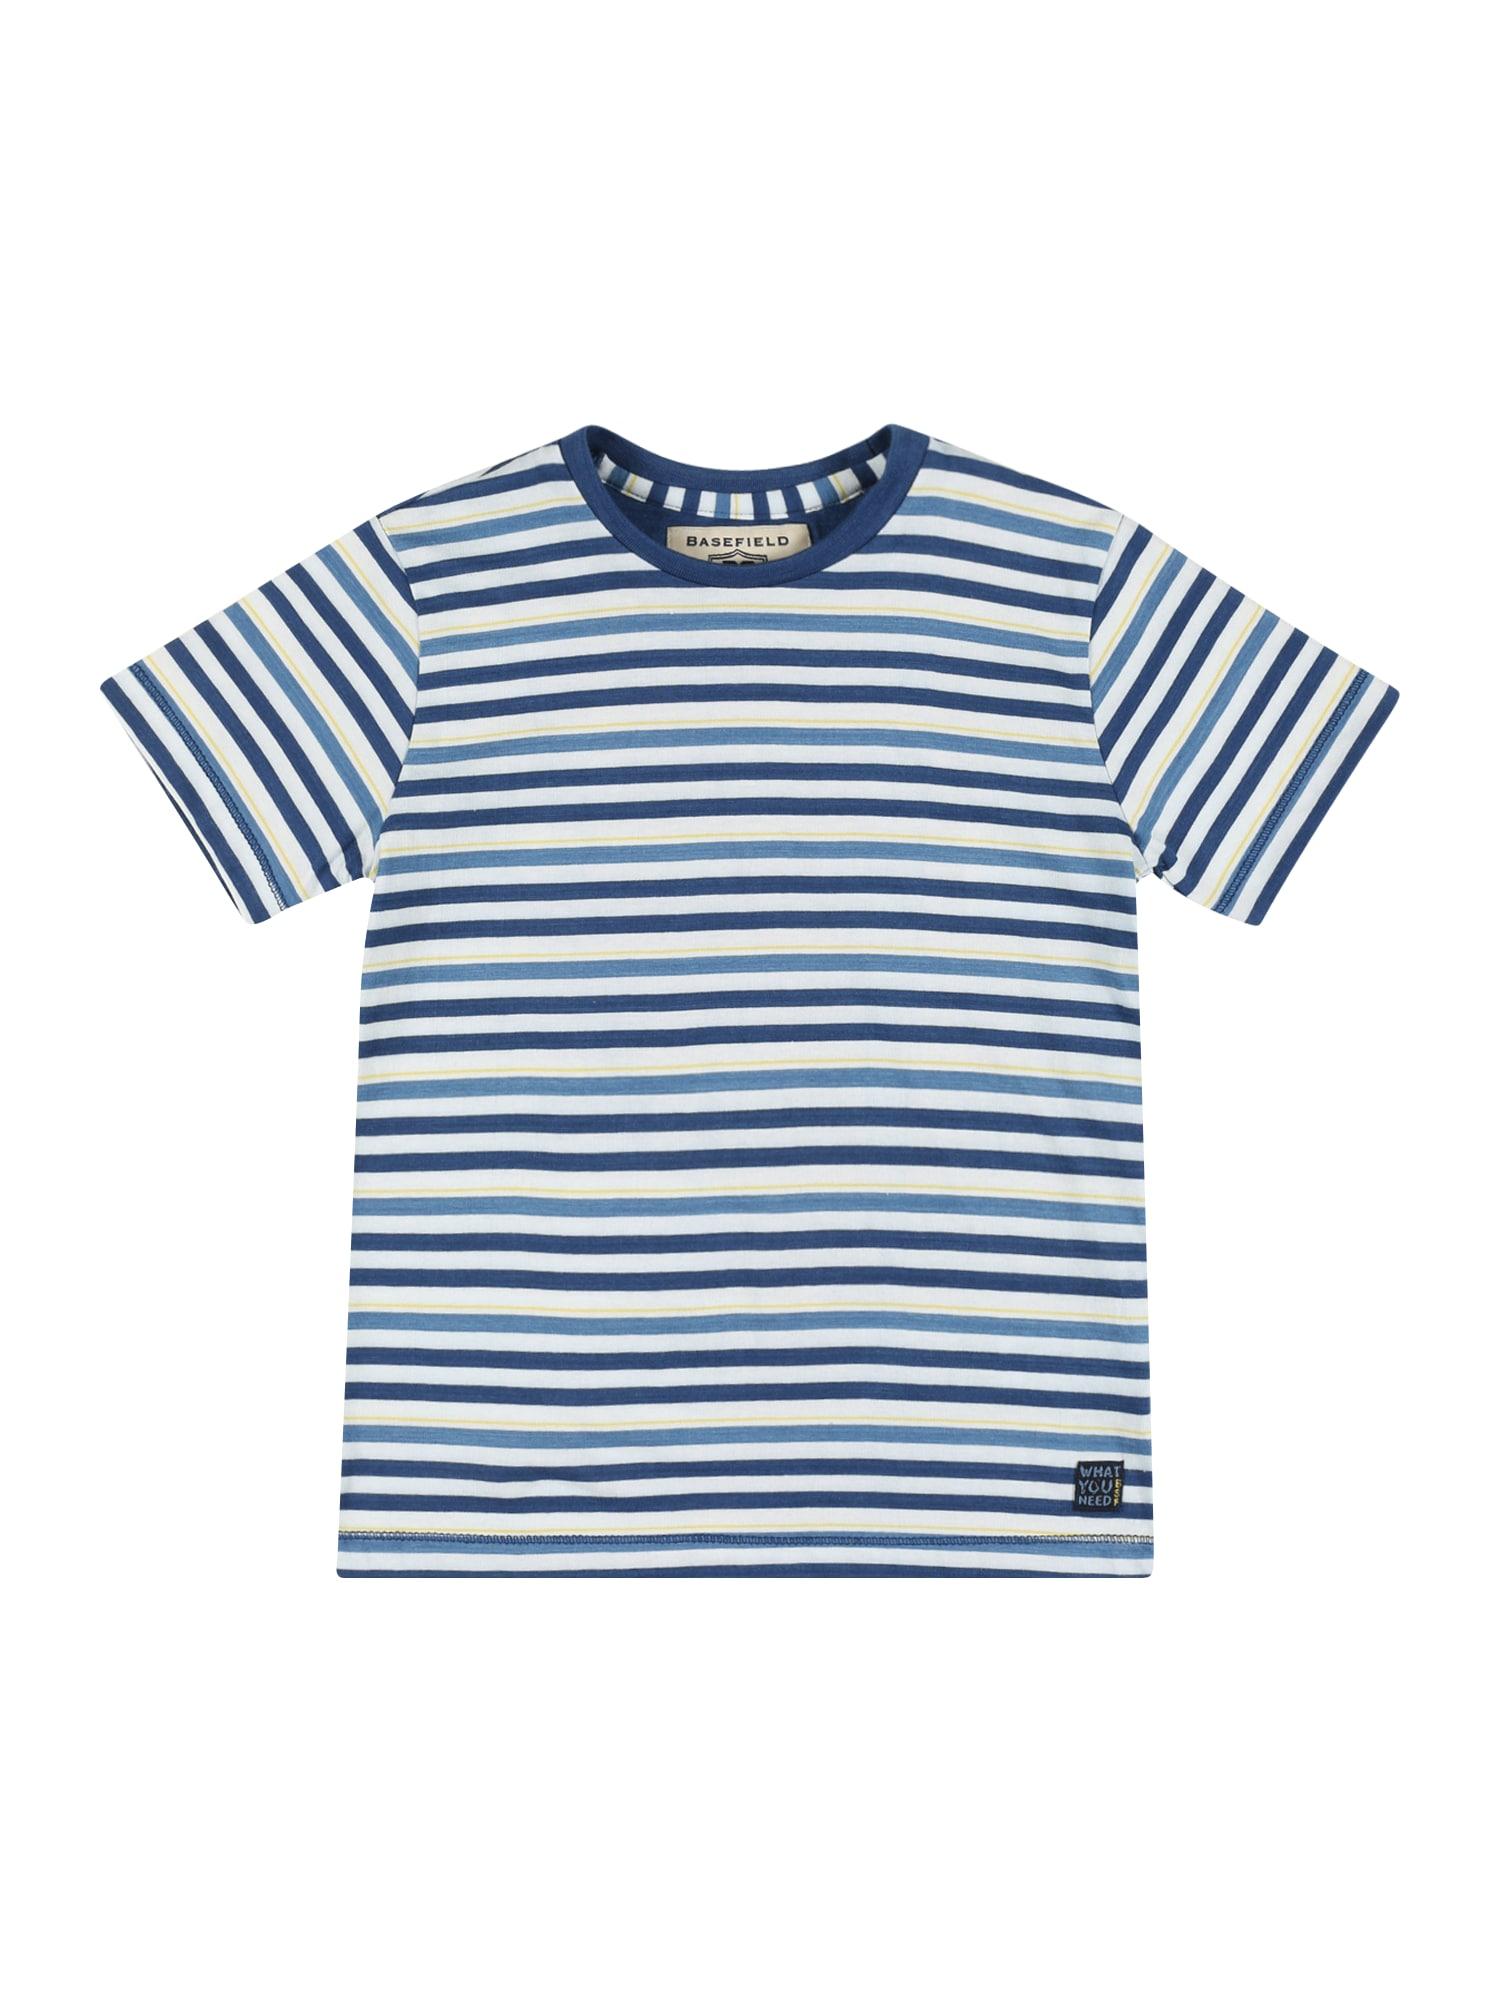 BASEFIELD Marškinėliai mėlyna / balta / geltona